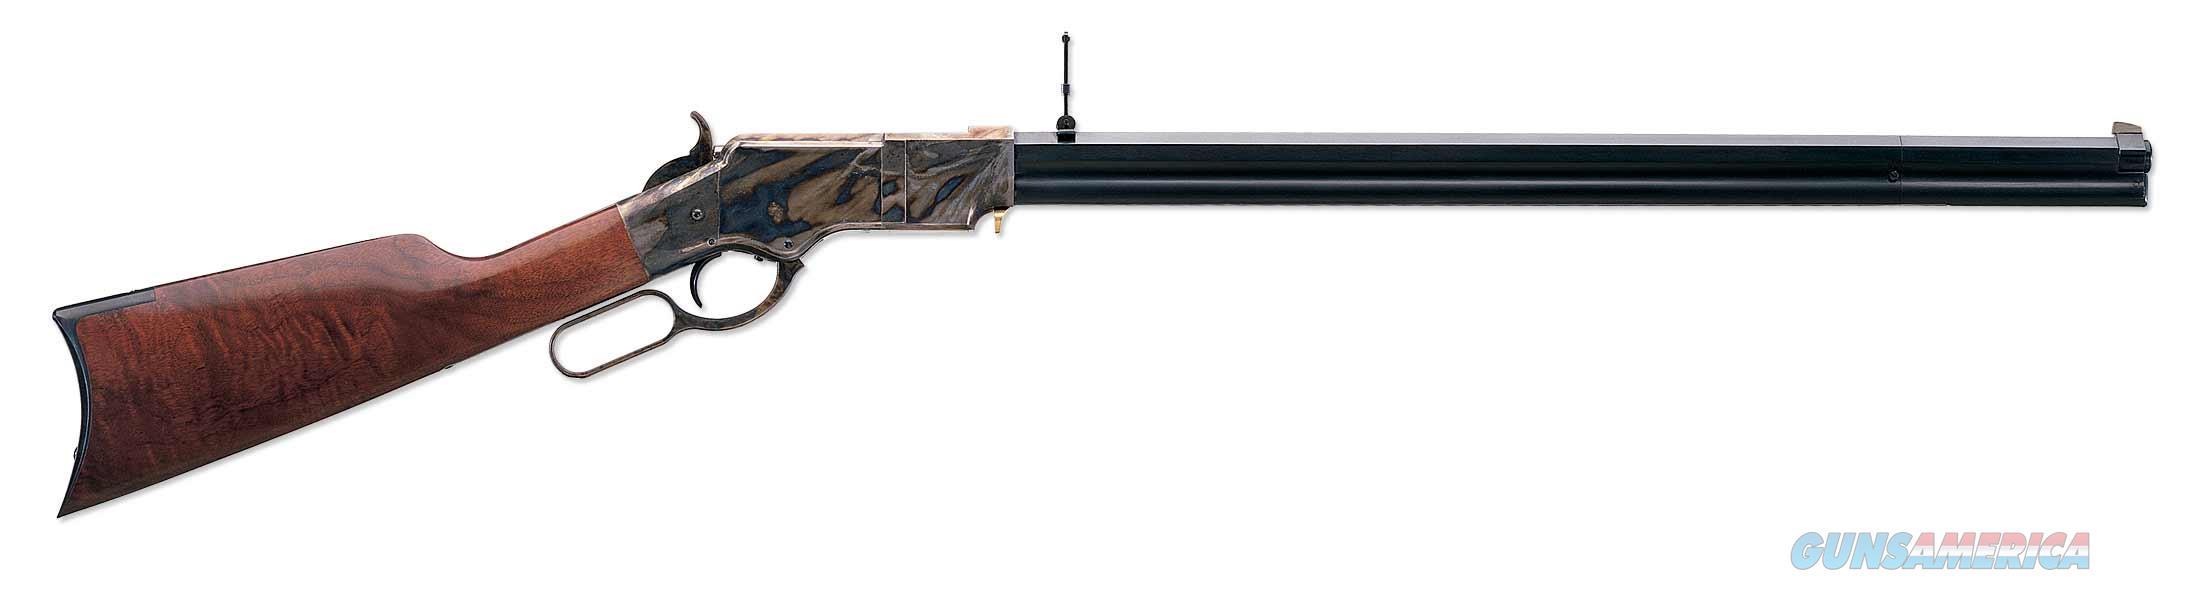 "Uberti 1860 Henry Steel 45 LC 24.25""BBL NIB 342360  Guns > Rifles > Uberti Rifles > Lever Action"